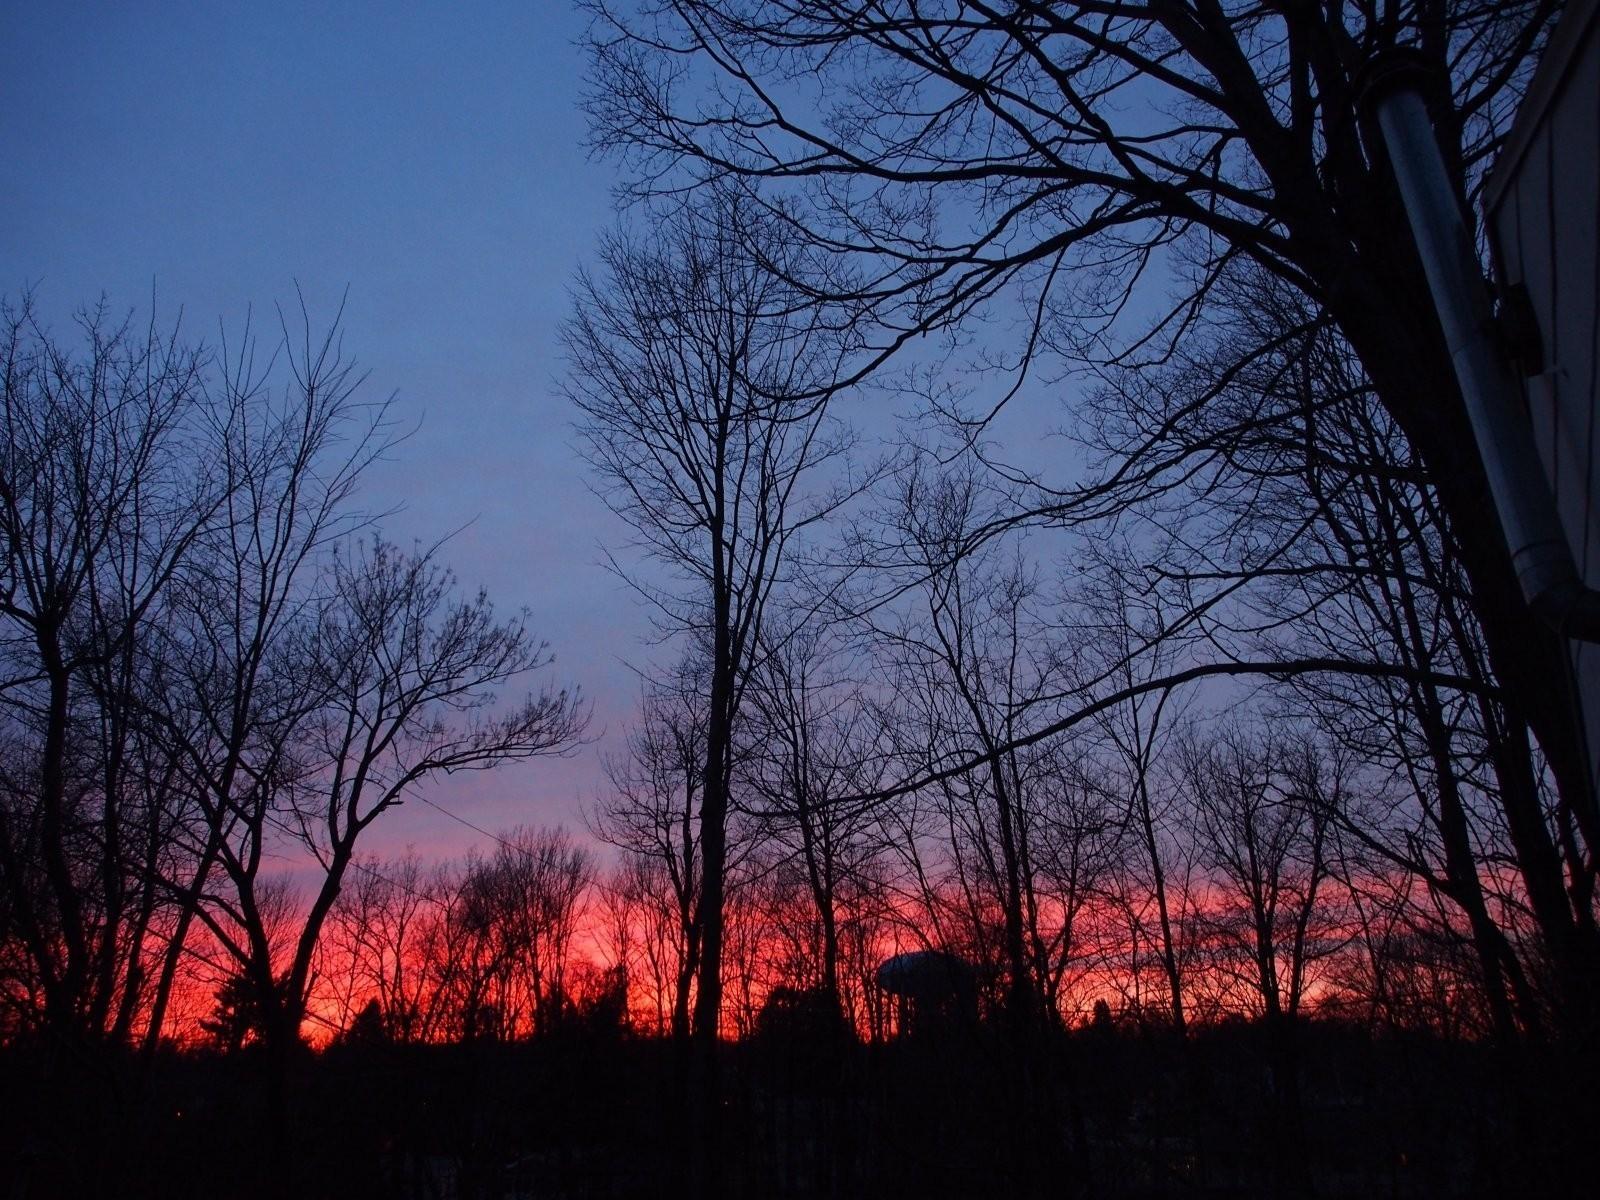 OMD Pickering Lane amazing sunset 028.JPG